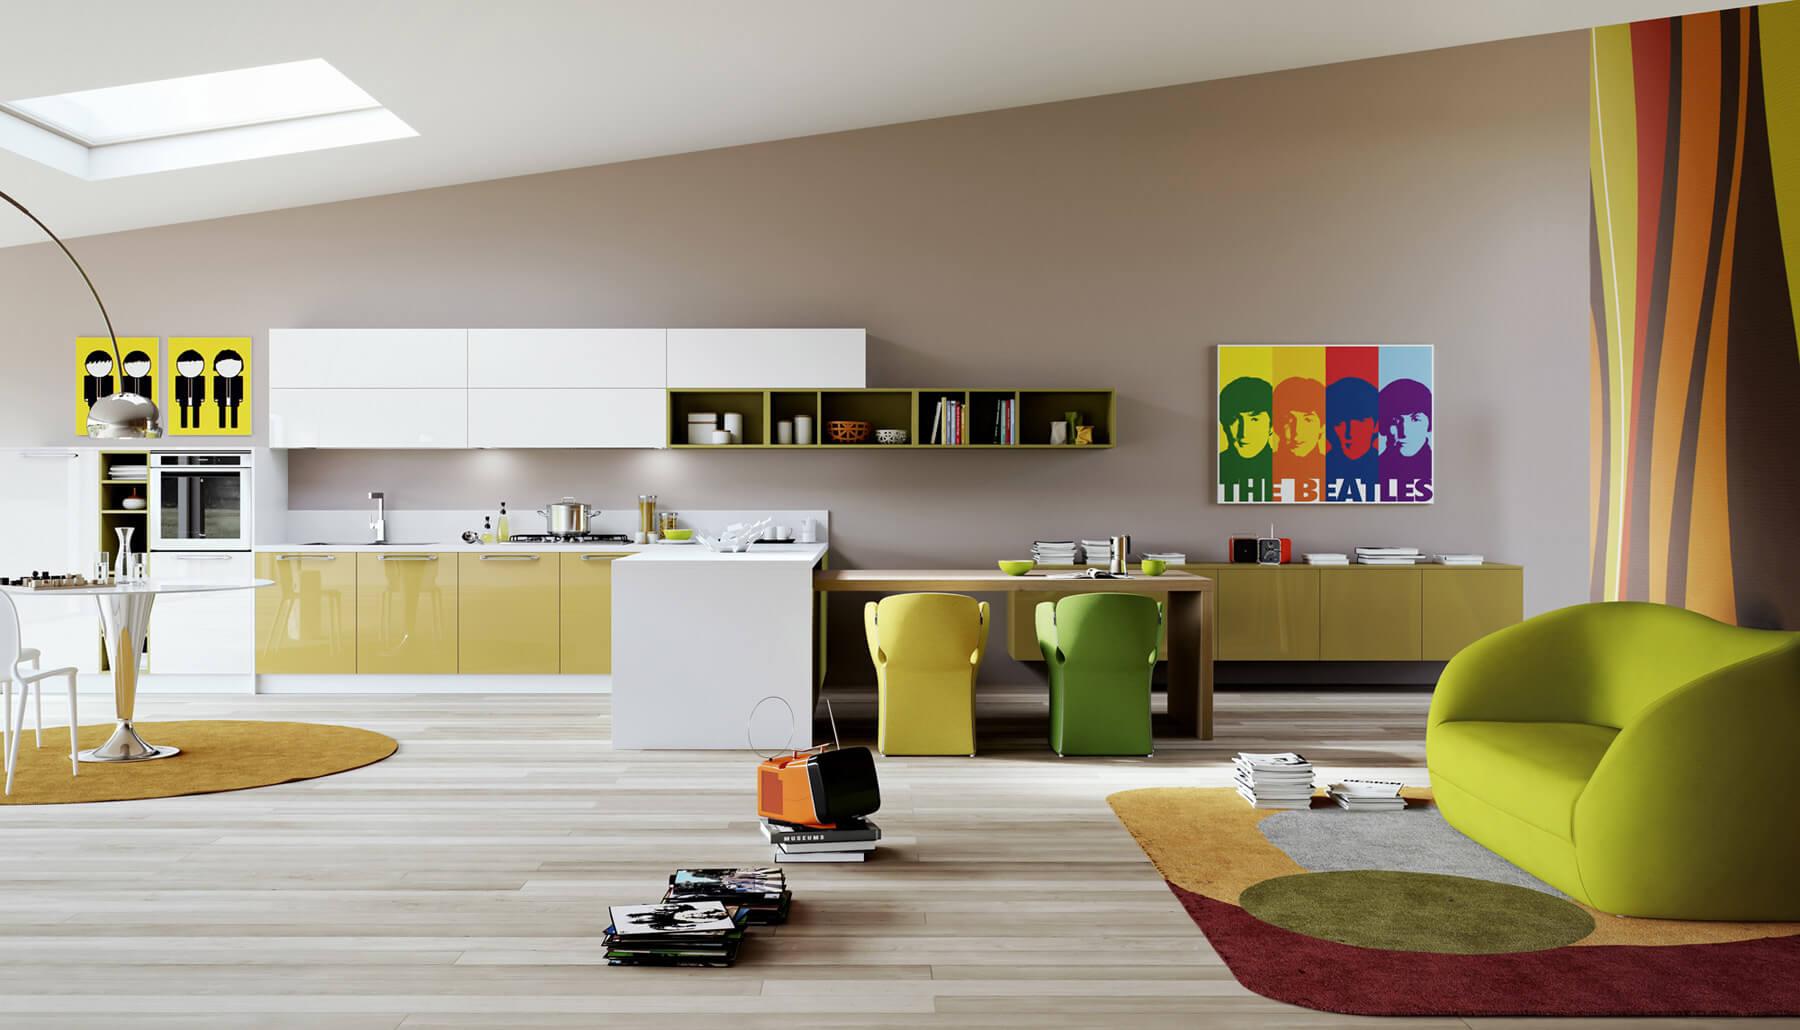 Kitchen design pop art style in green tones